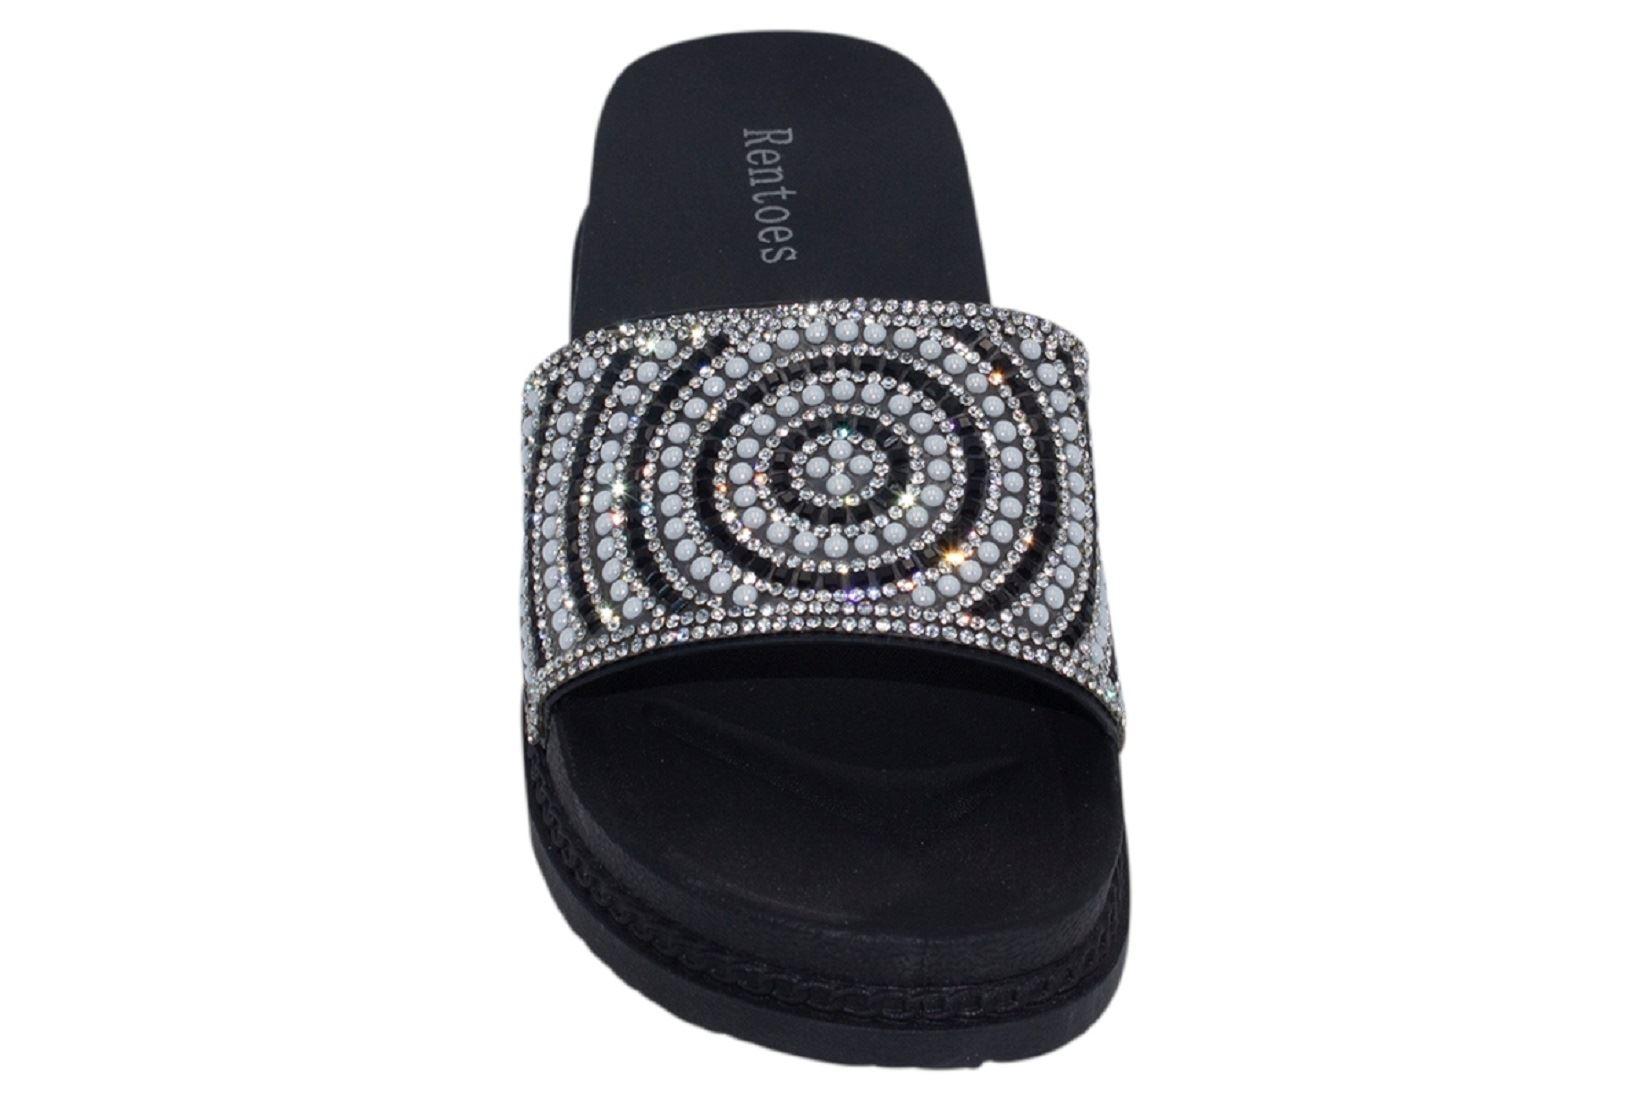 Womens-Sliders-Casual-Slippers-Mules-Ladies-Diamante-Flip-Flop-Sandals-Shoes thumbnail 102